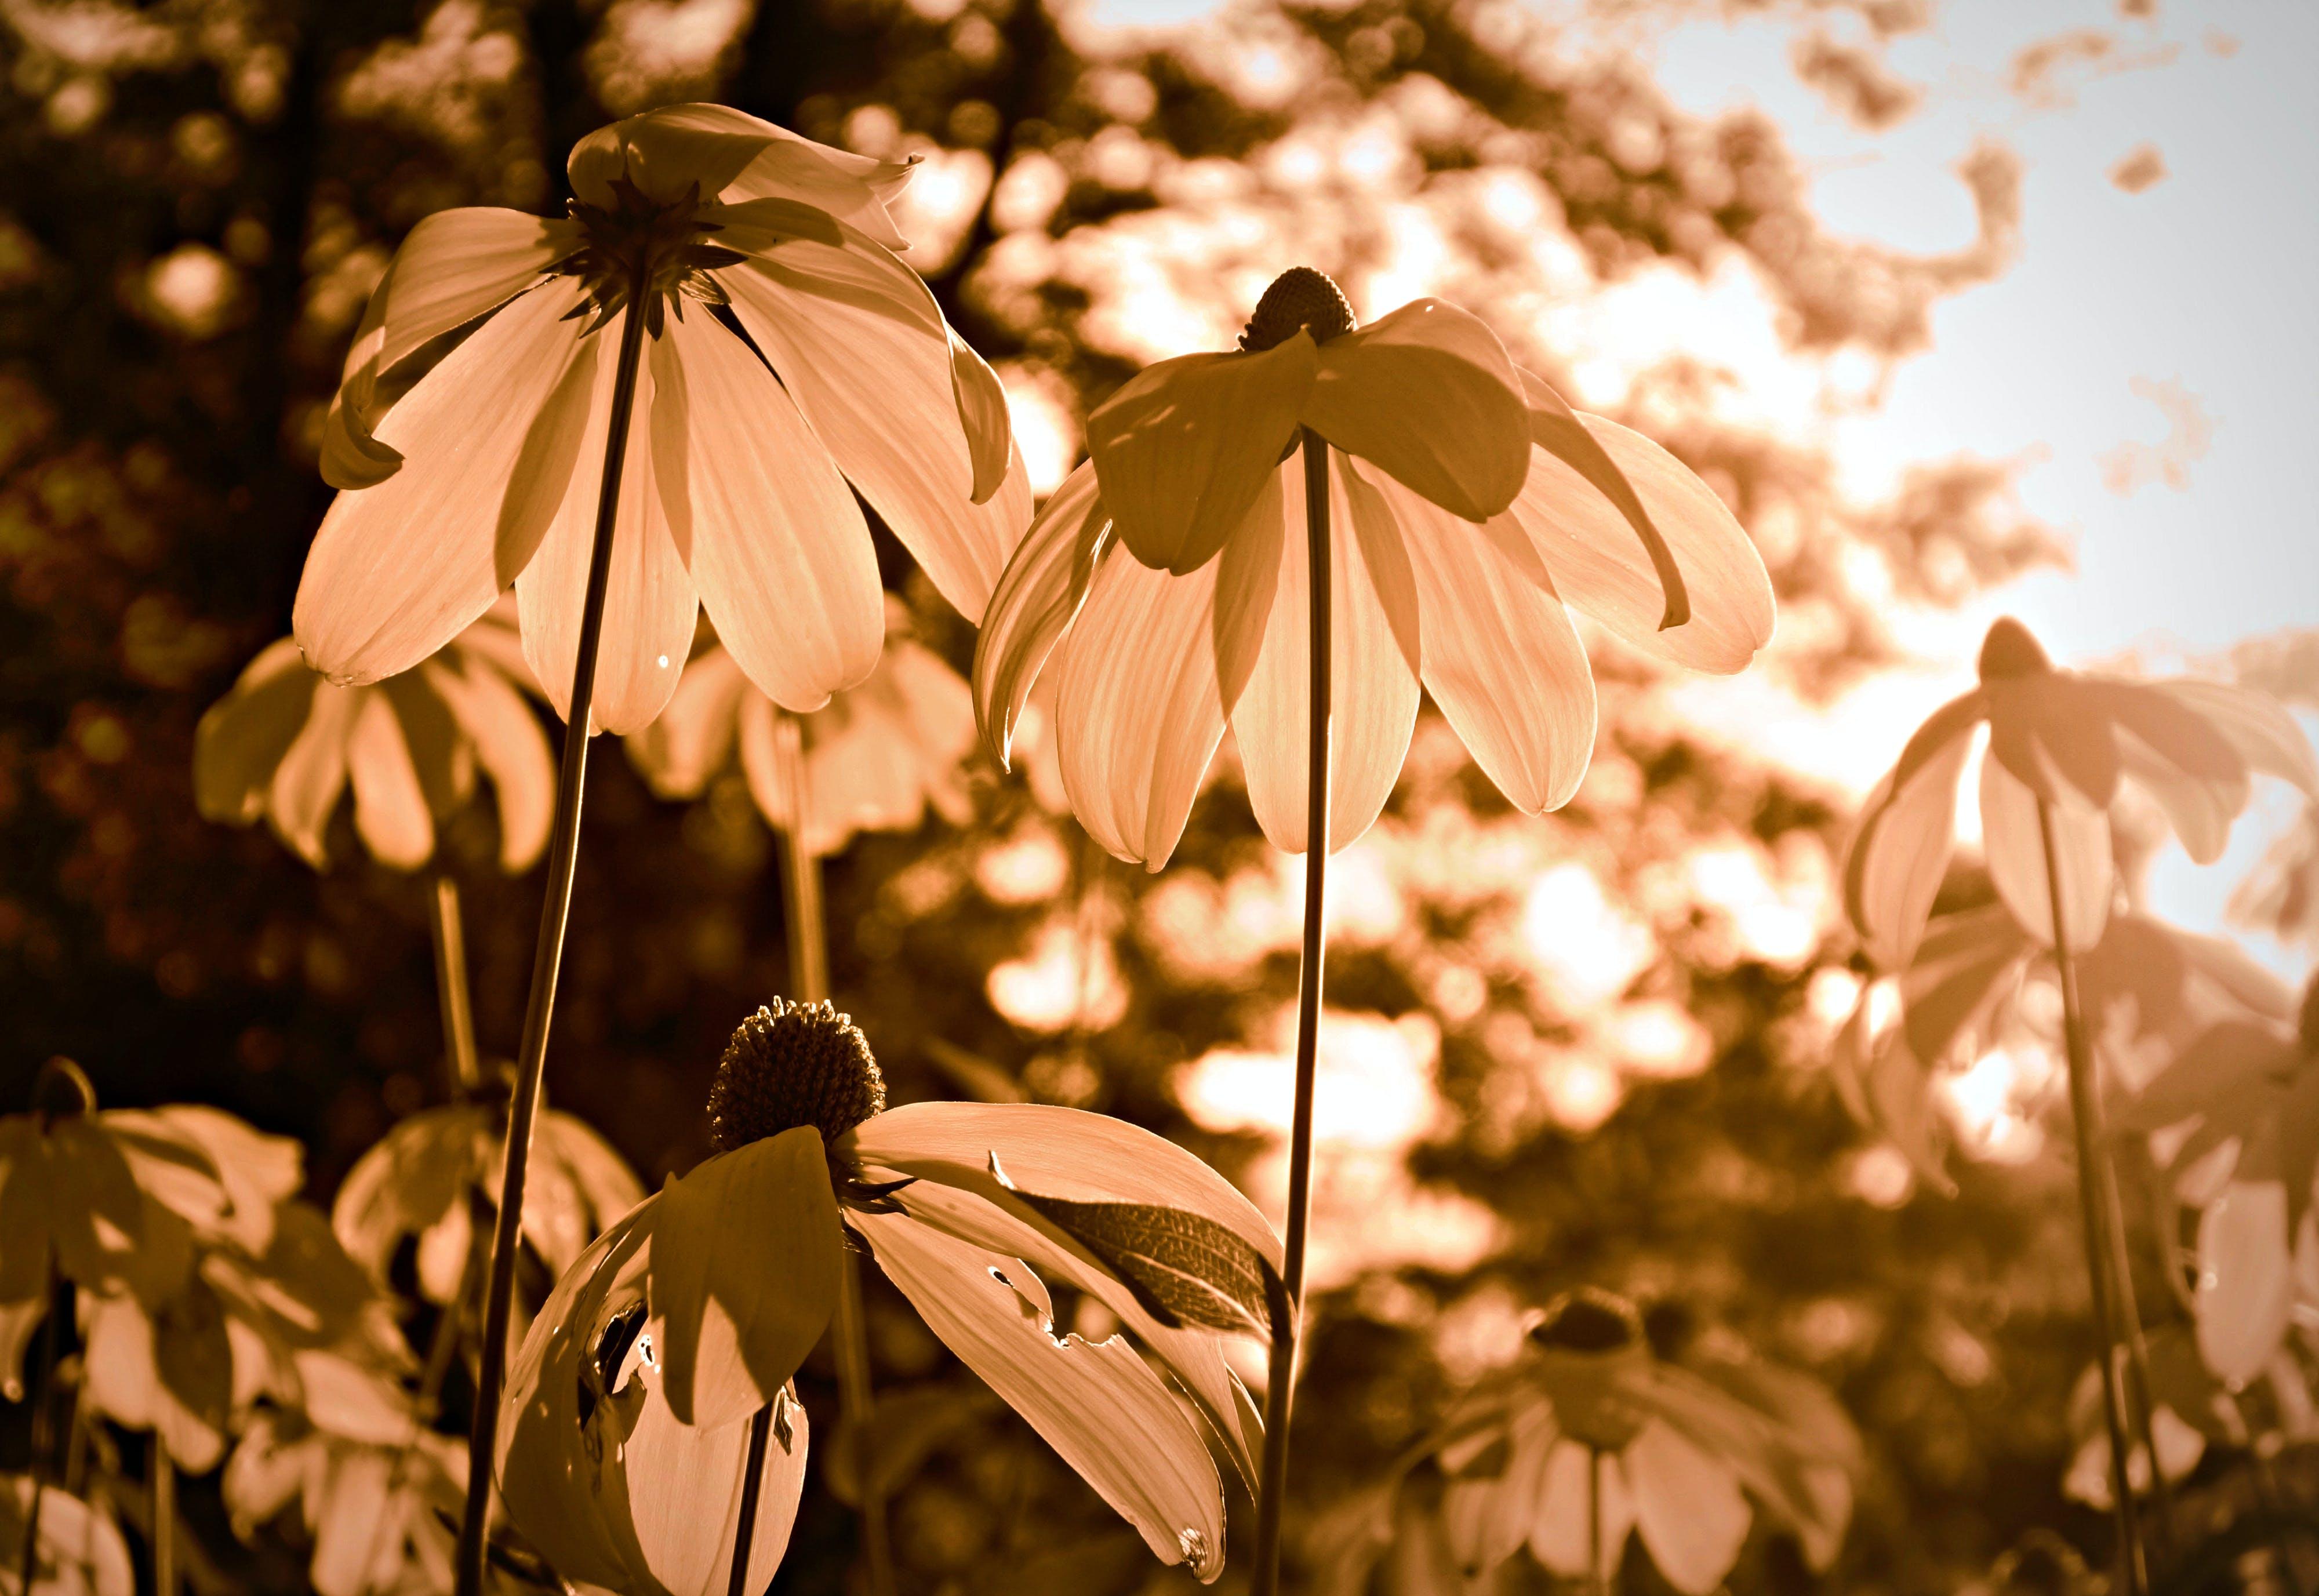 Free stock photo of summer, plant, flower, echinacea